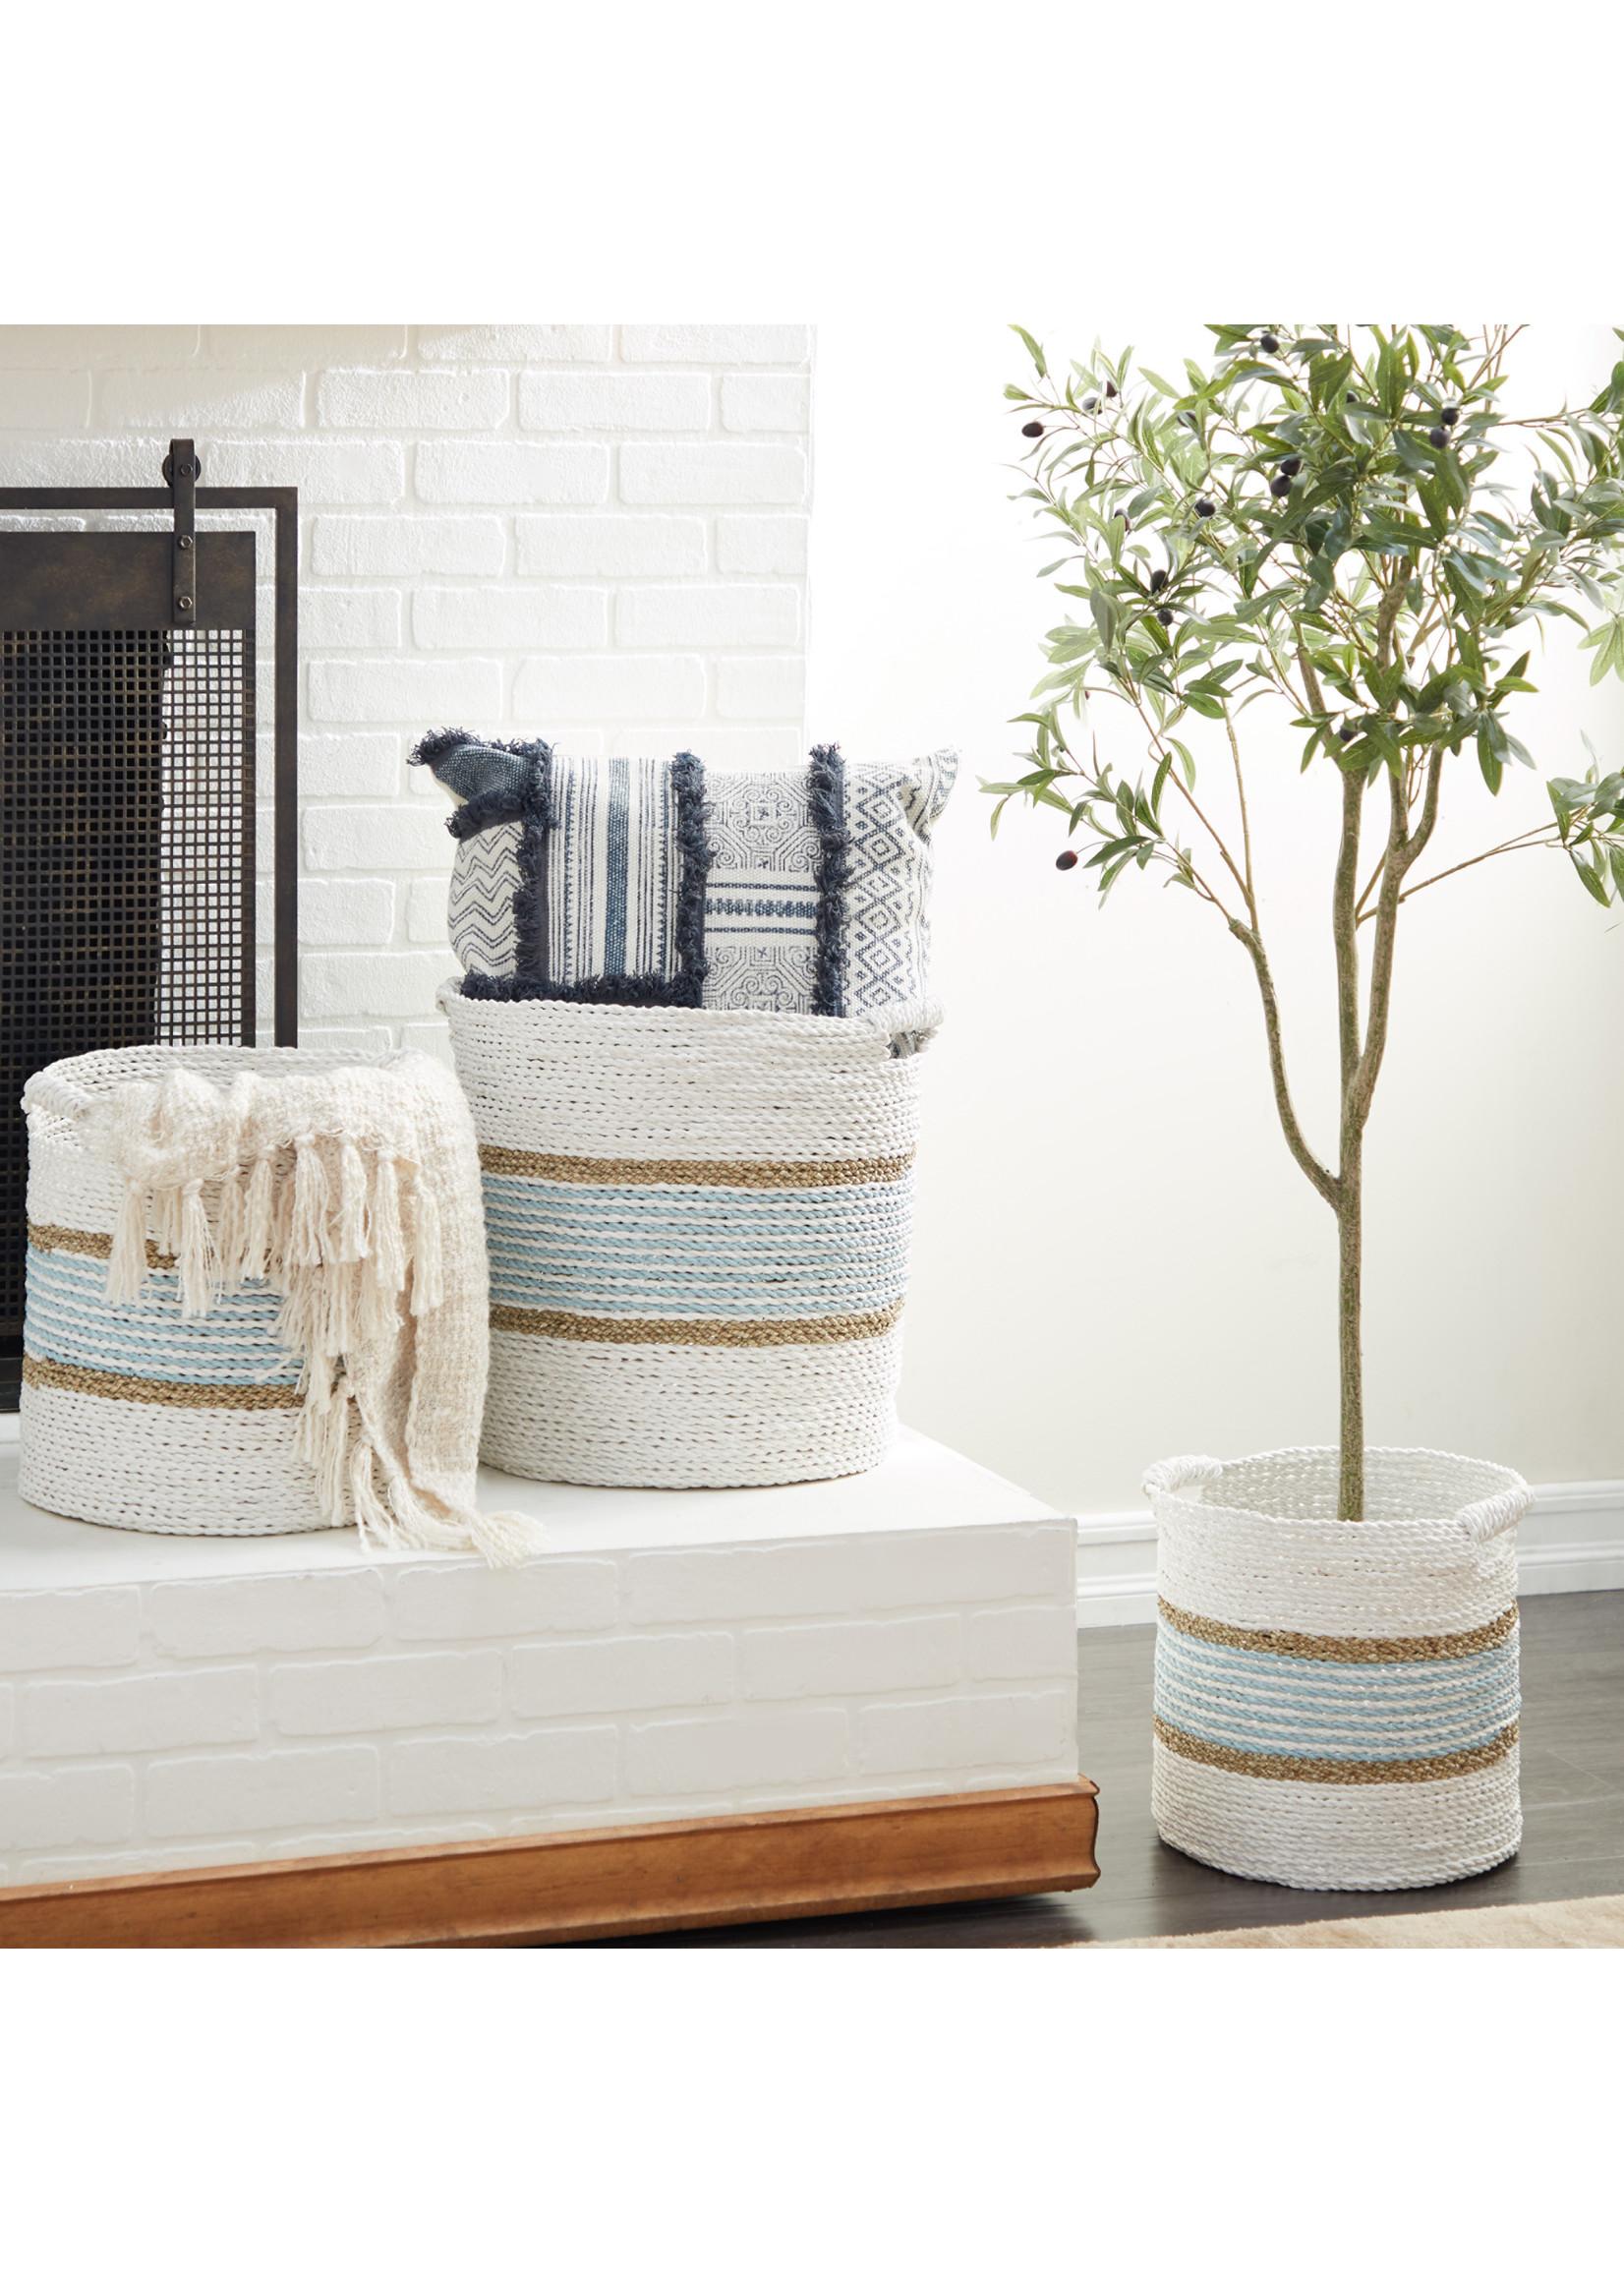 UMA Enterprises Seagrass Basket - Large